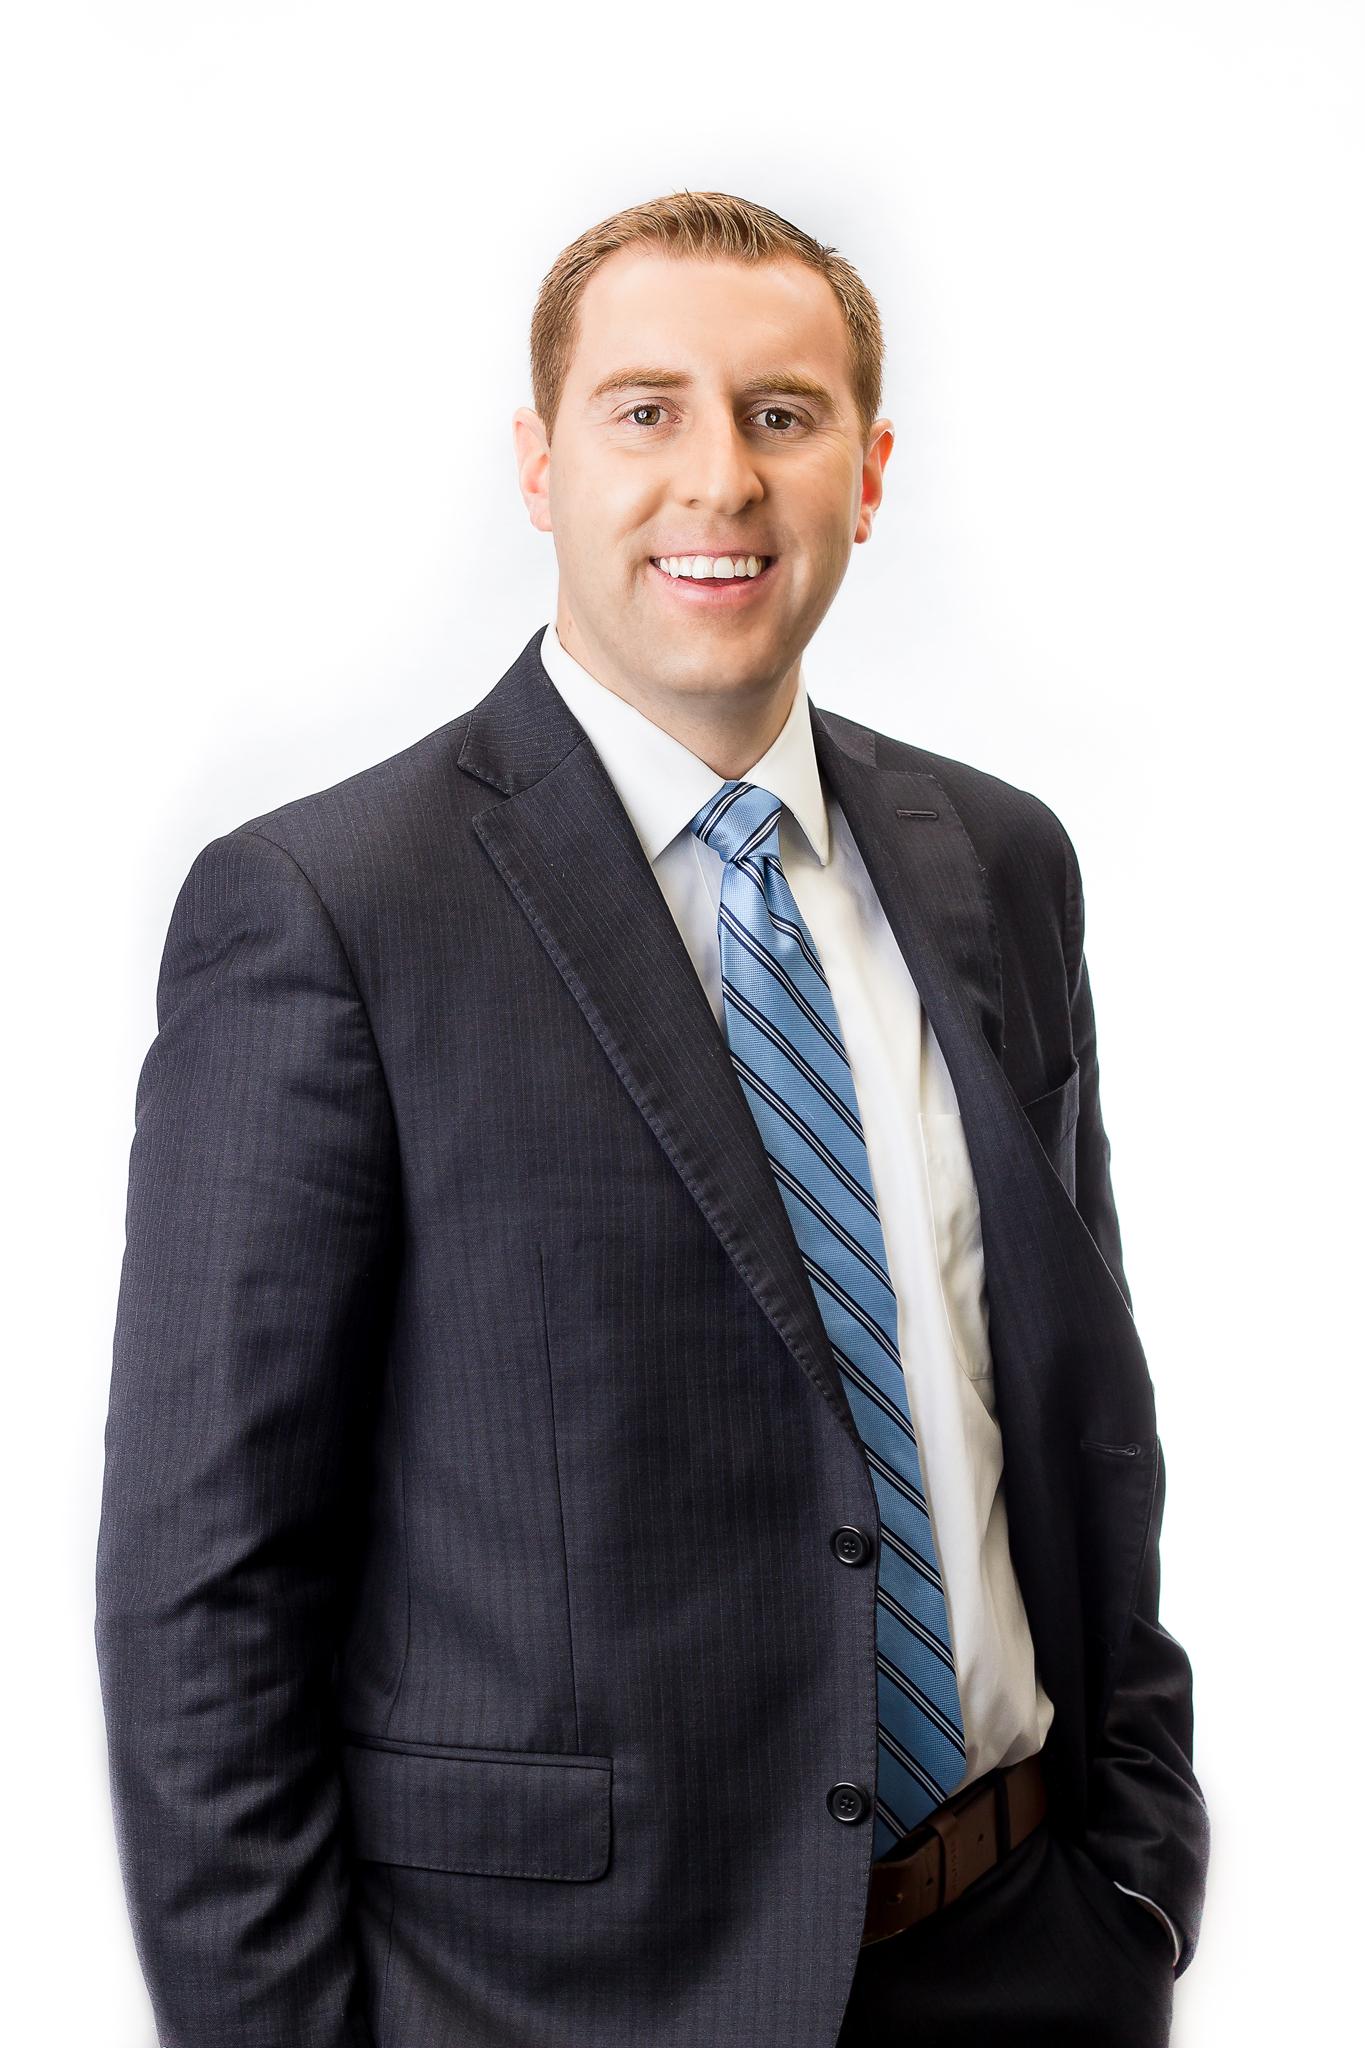 Stuart Milne - Professional Headshot | Tempe, AZ